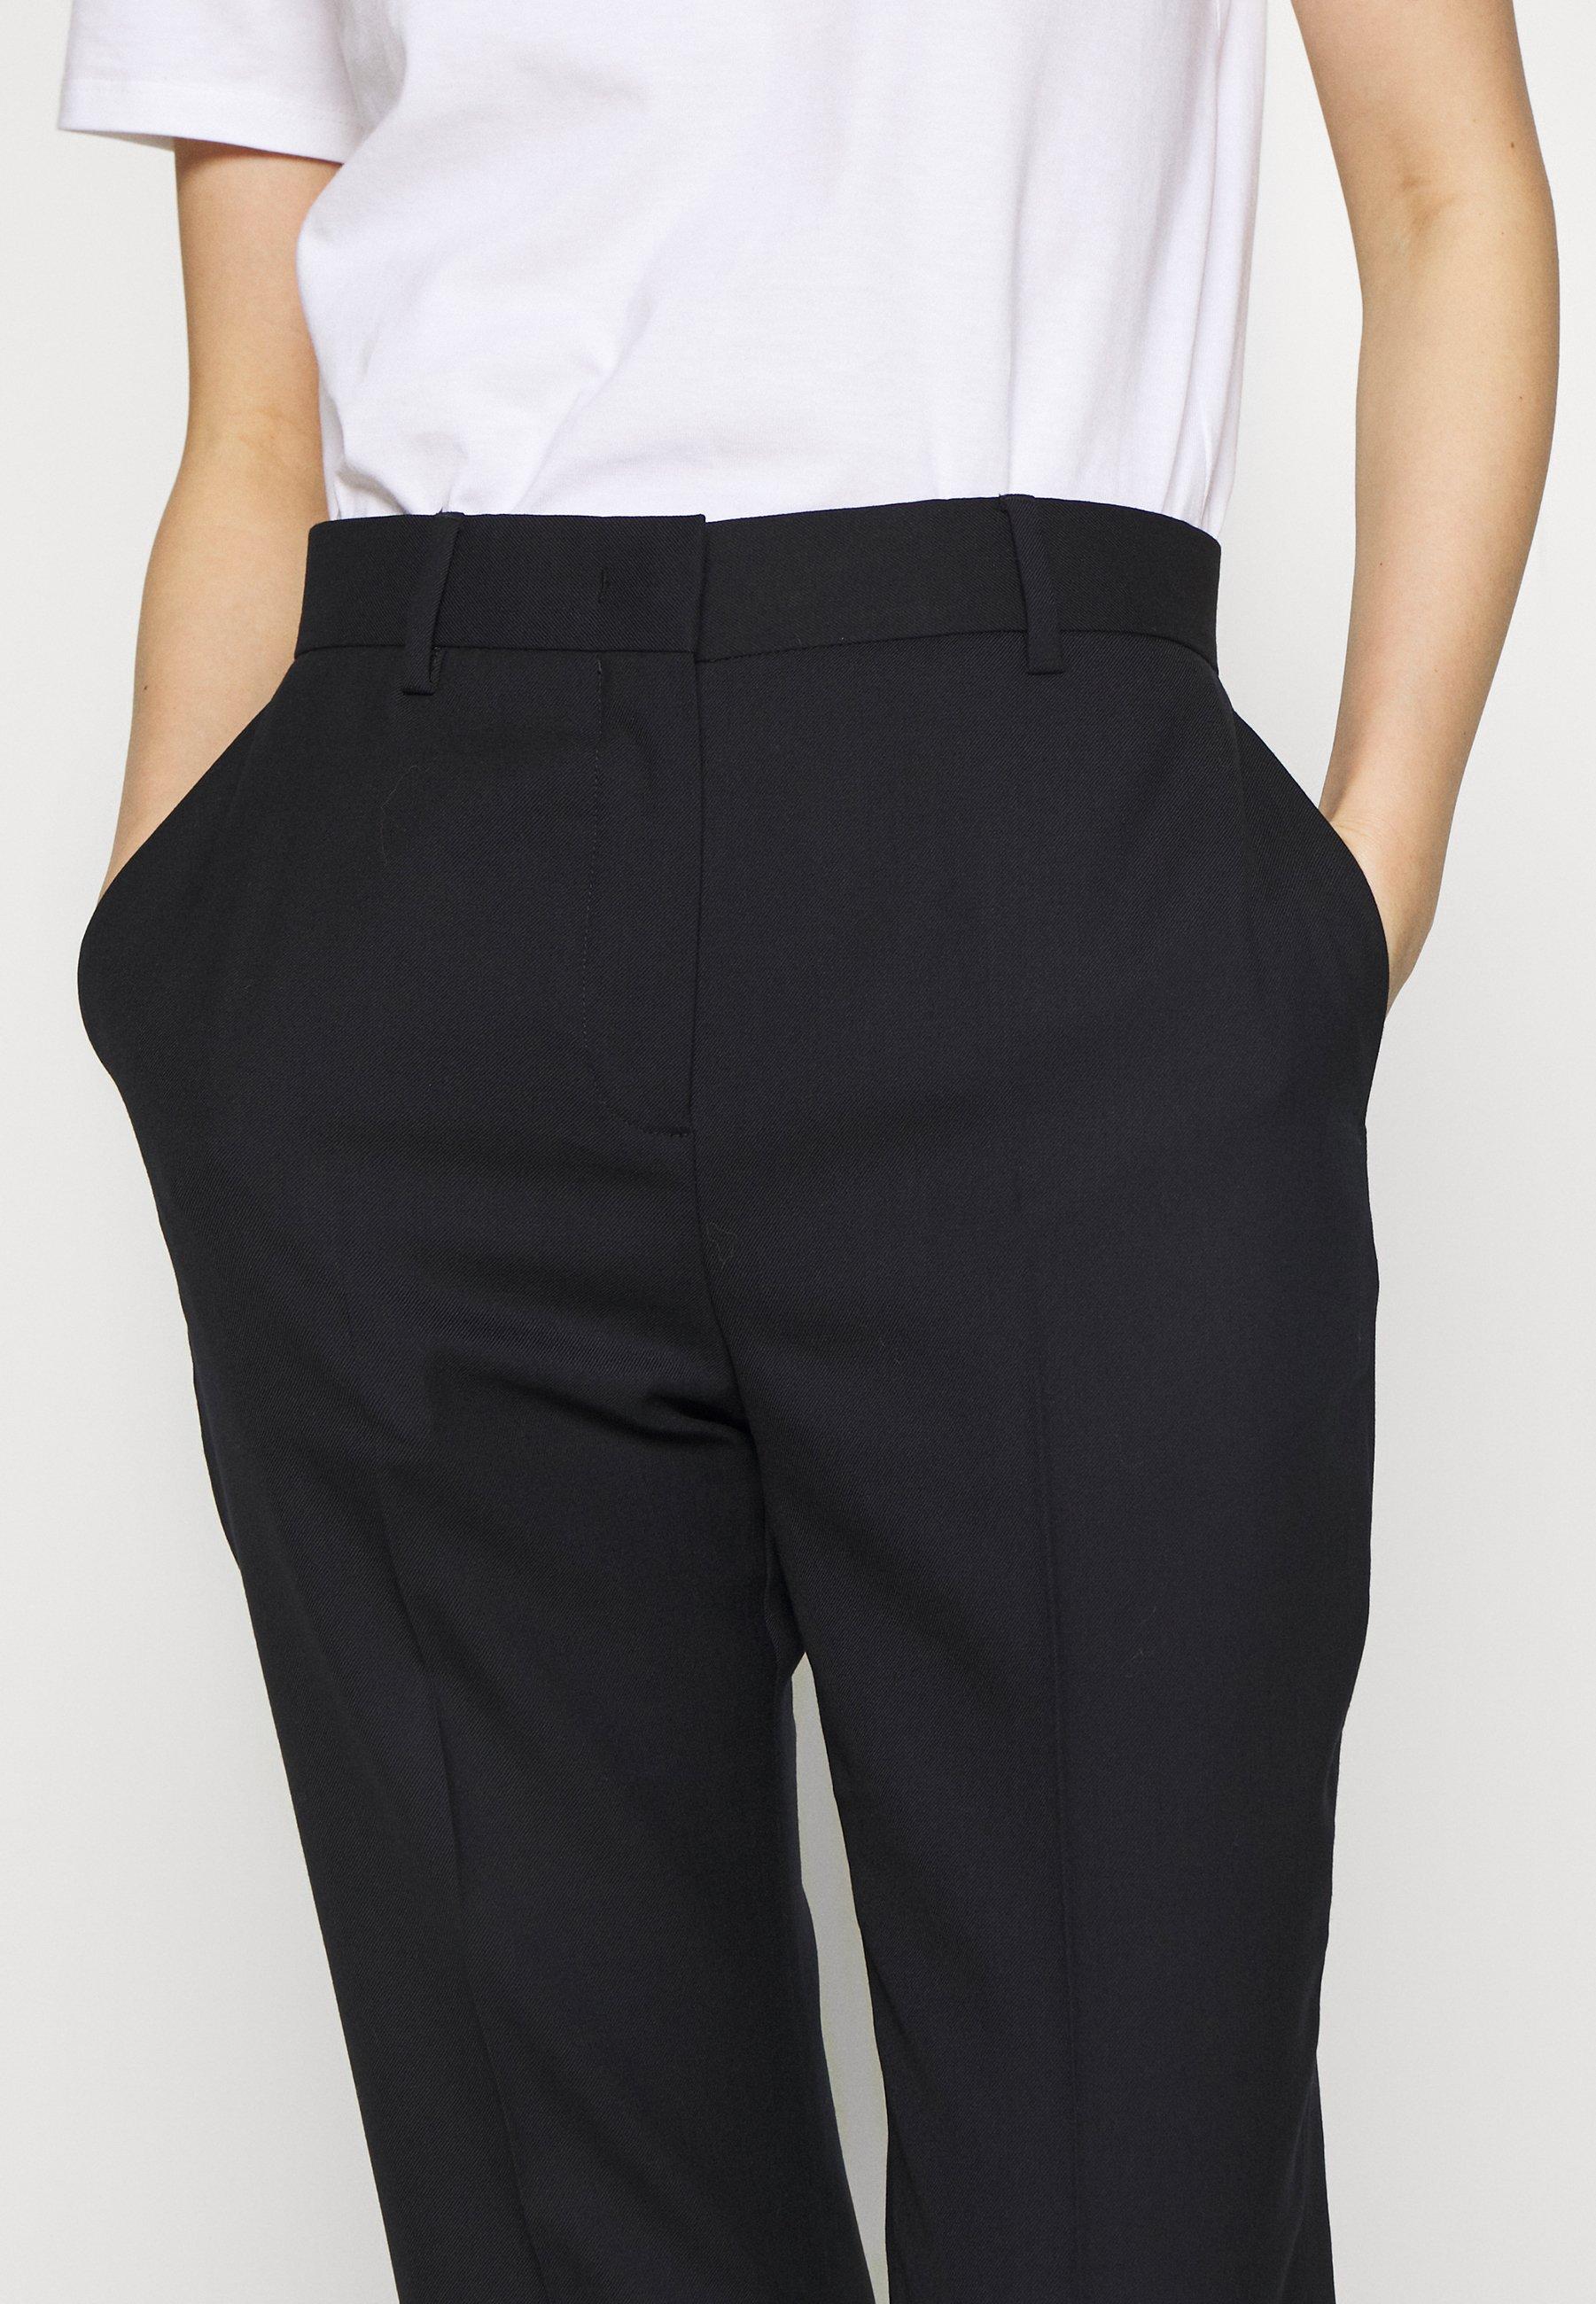 Paul Smith Pantalon Classique - Dark Navy qSHlFcw